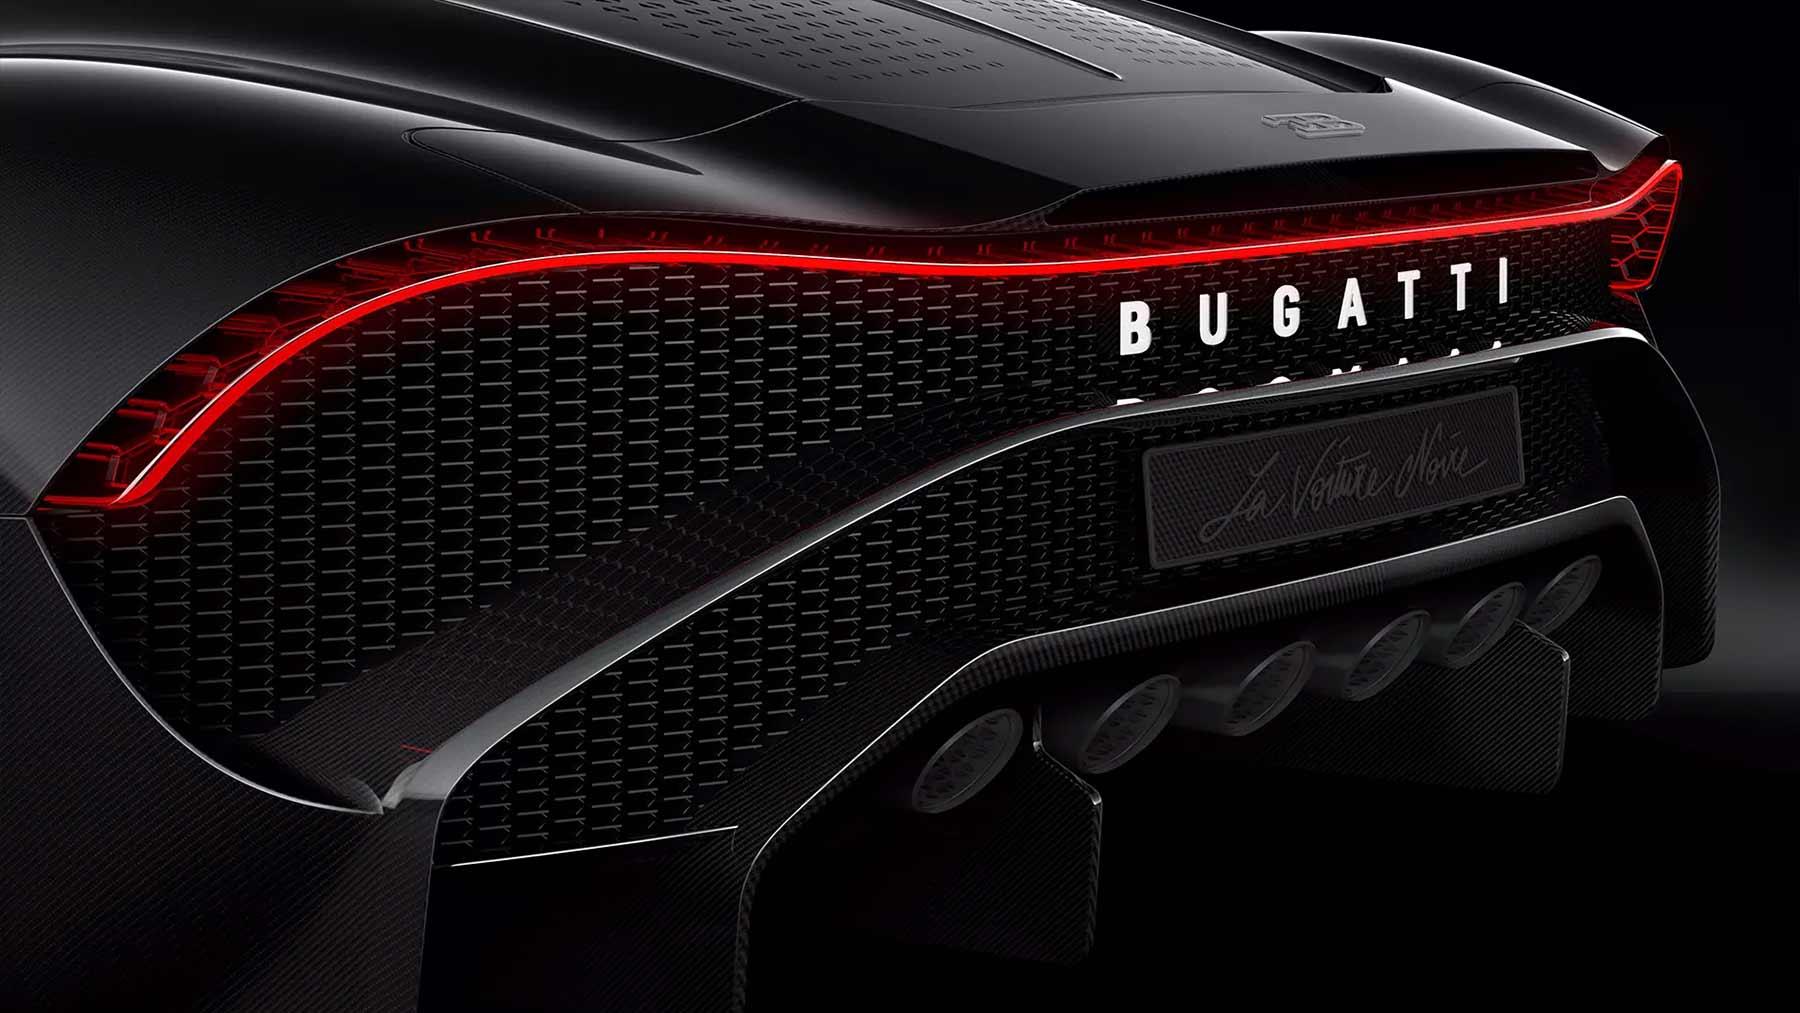 Bugatti La Voiture Noire Bugatti-La-Voiture-Noire_07